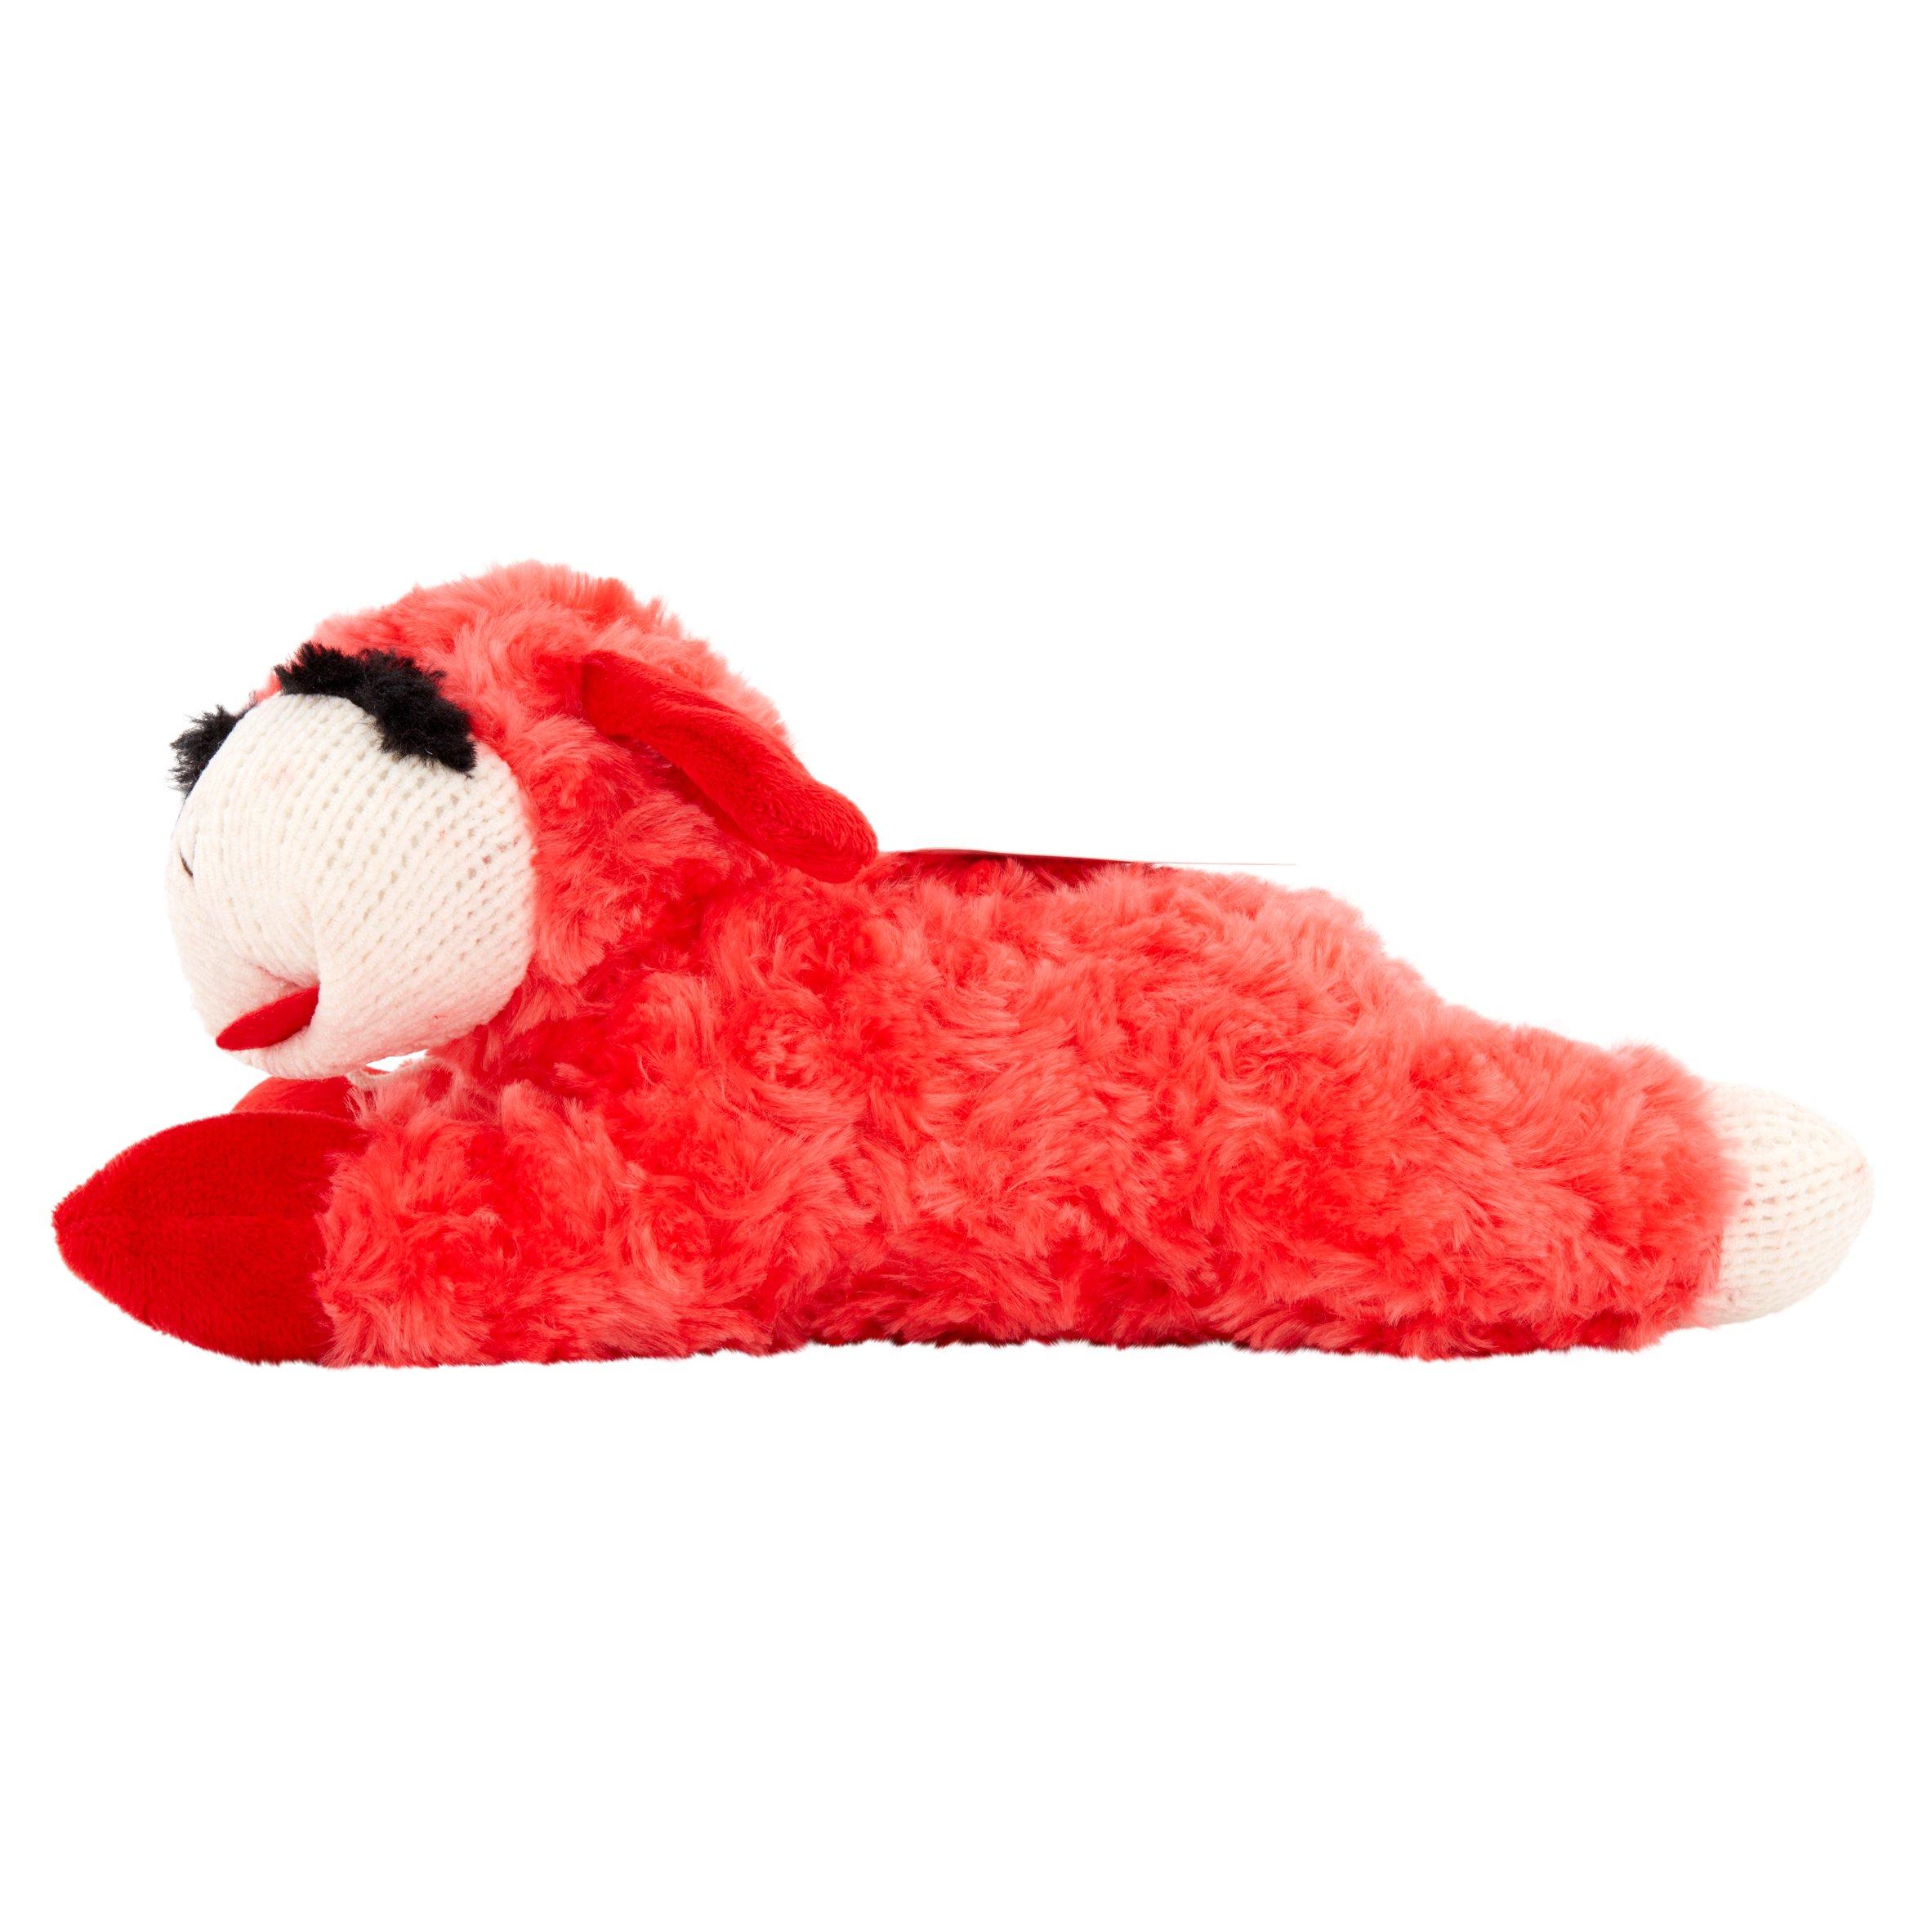 DreamWorks Multipet Lamb Chop Dog Toy by Multipet International